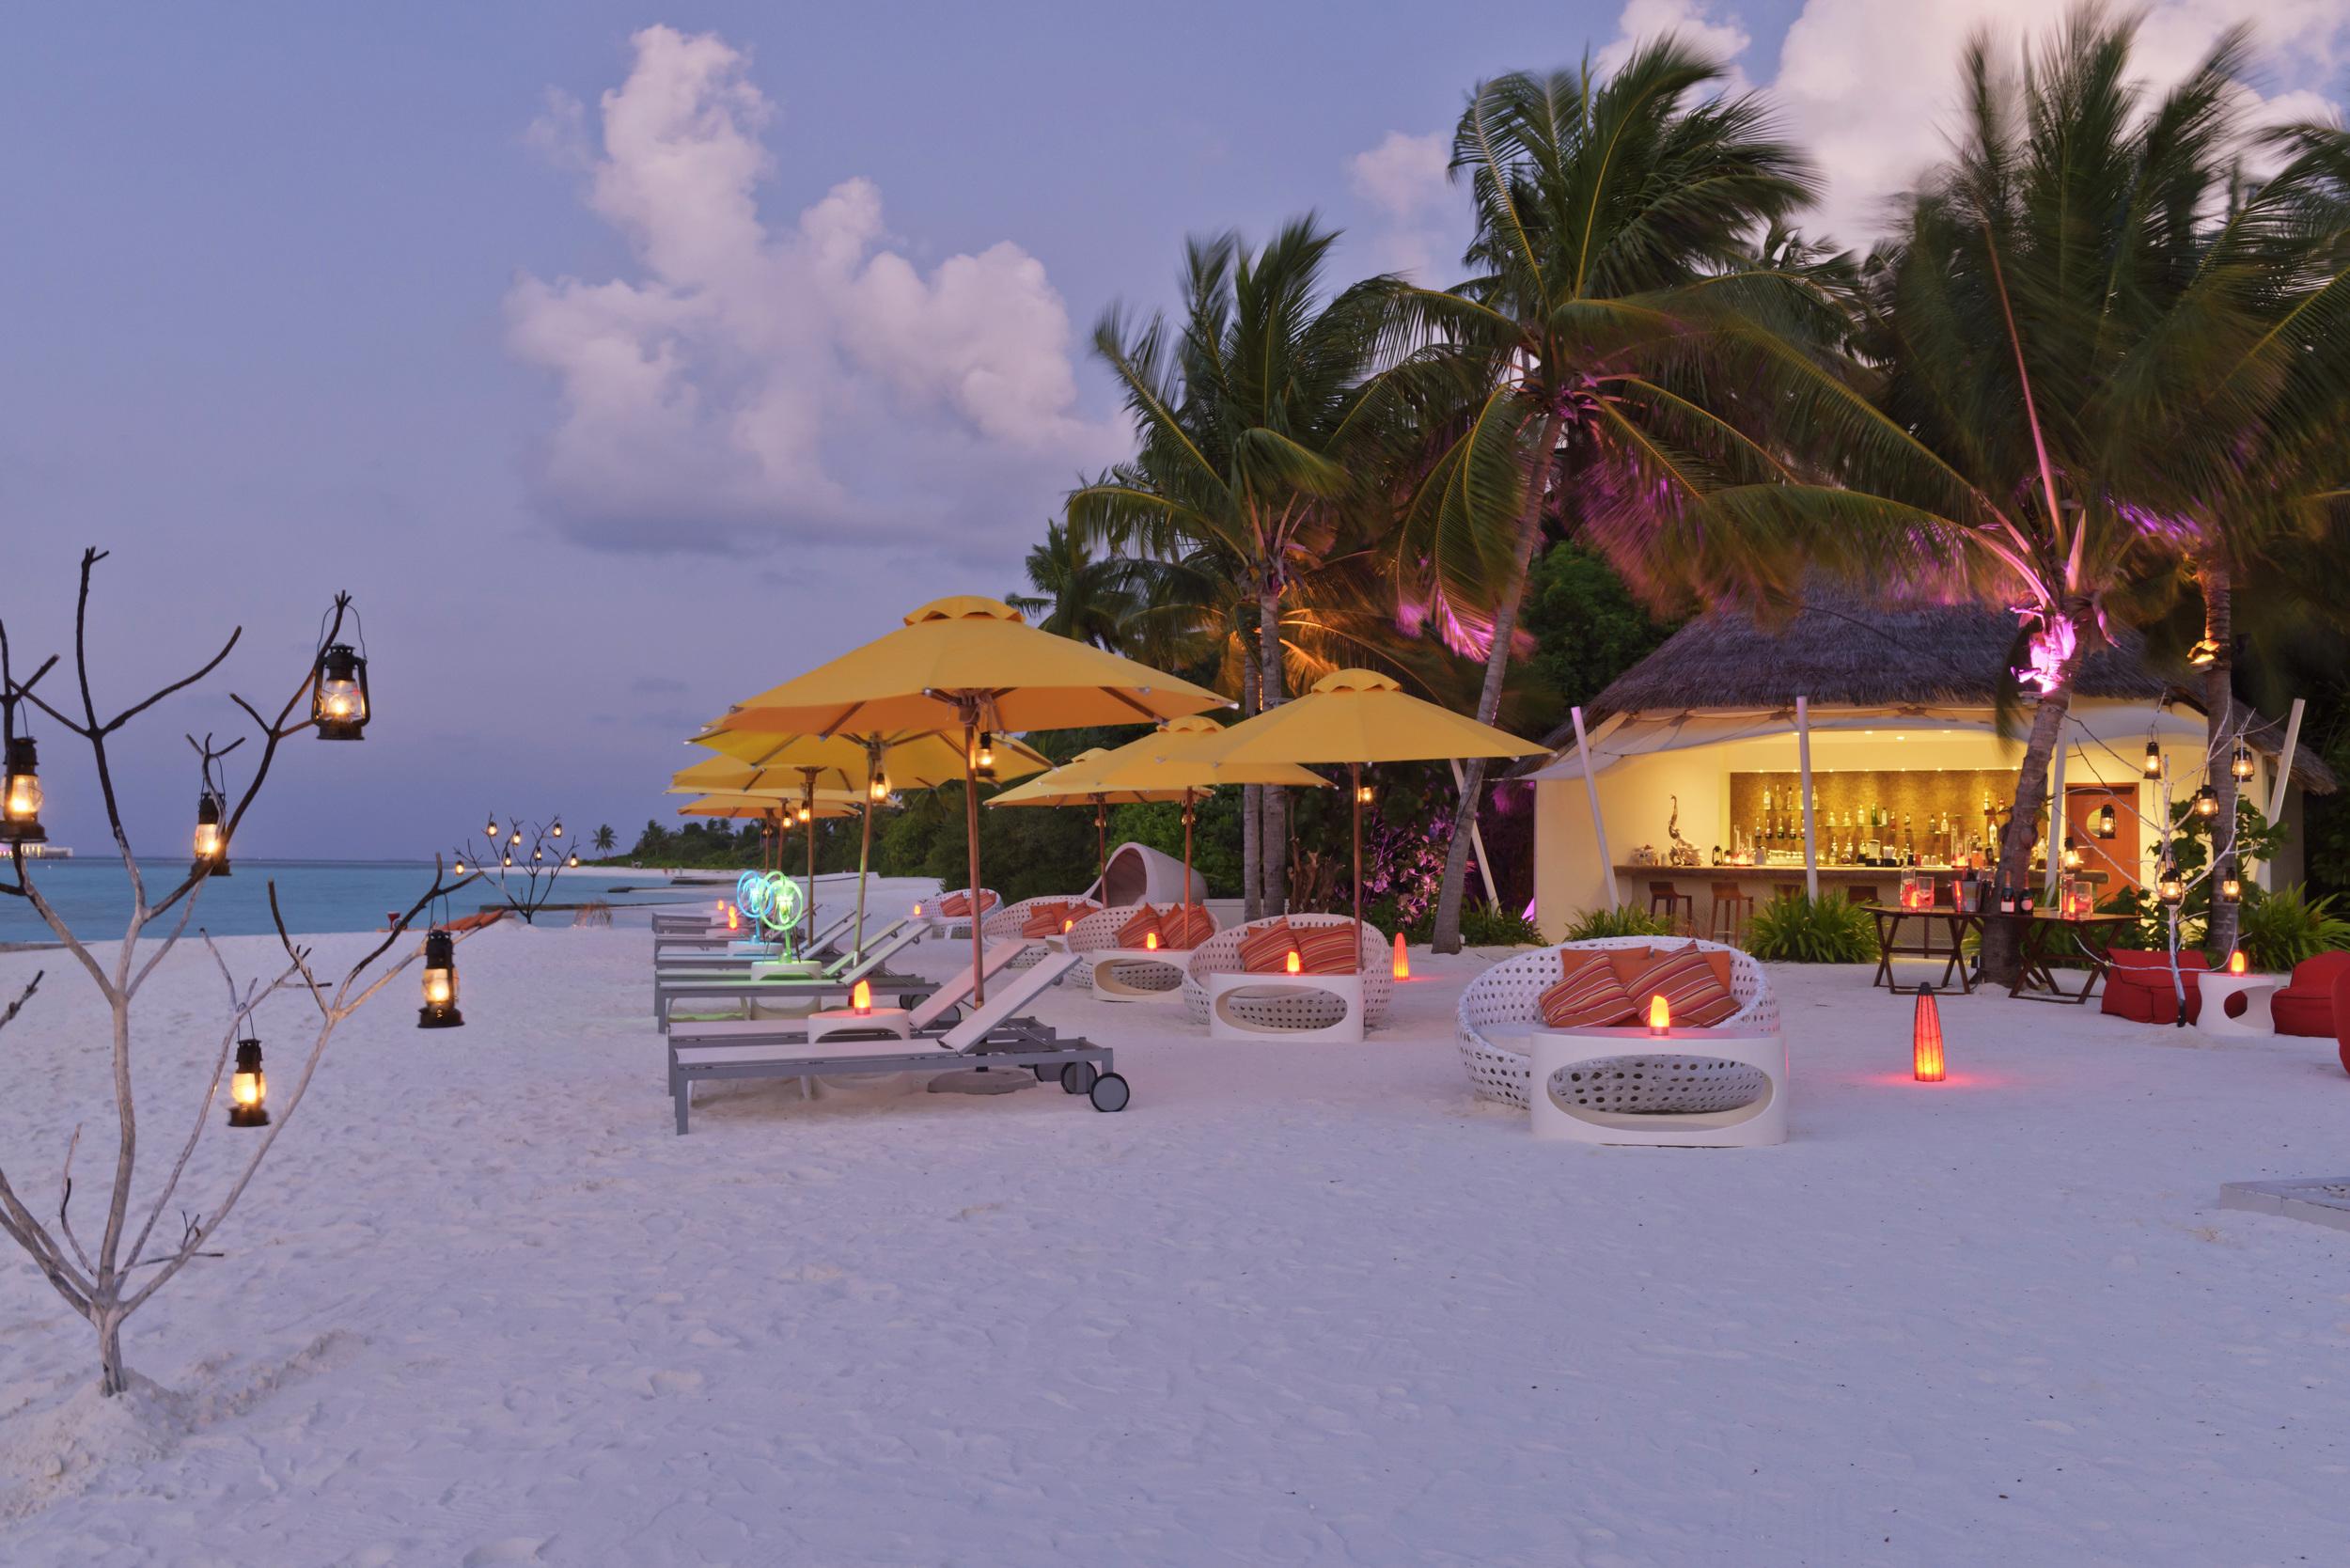 Hi_PNIY_67619620_Dune_Beach_Bar_at_Night.jpg